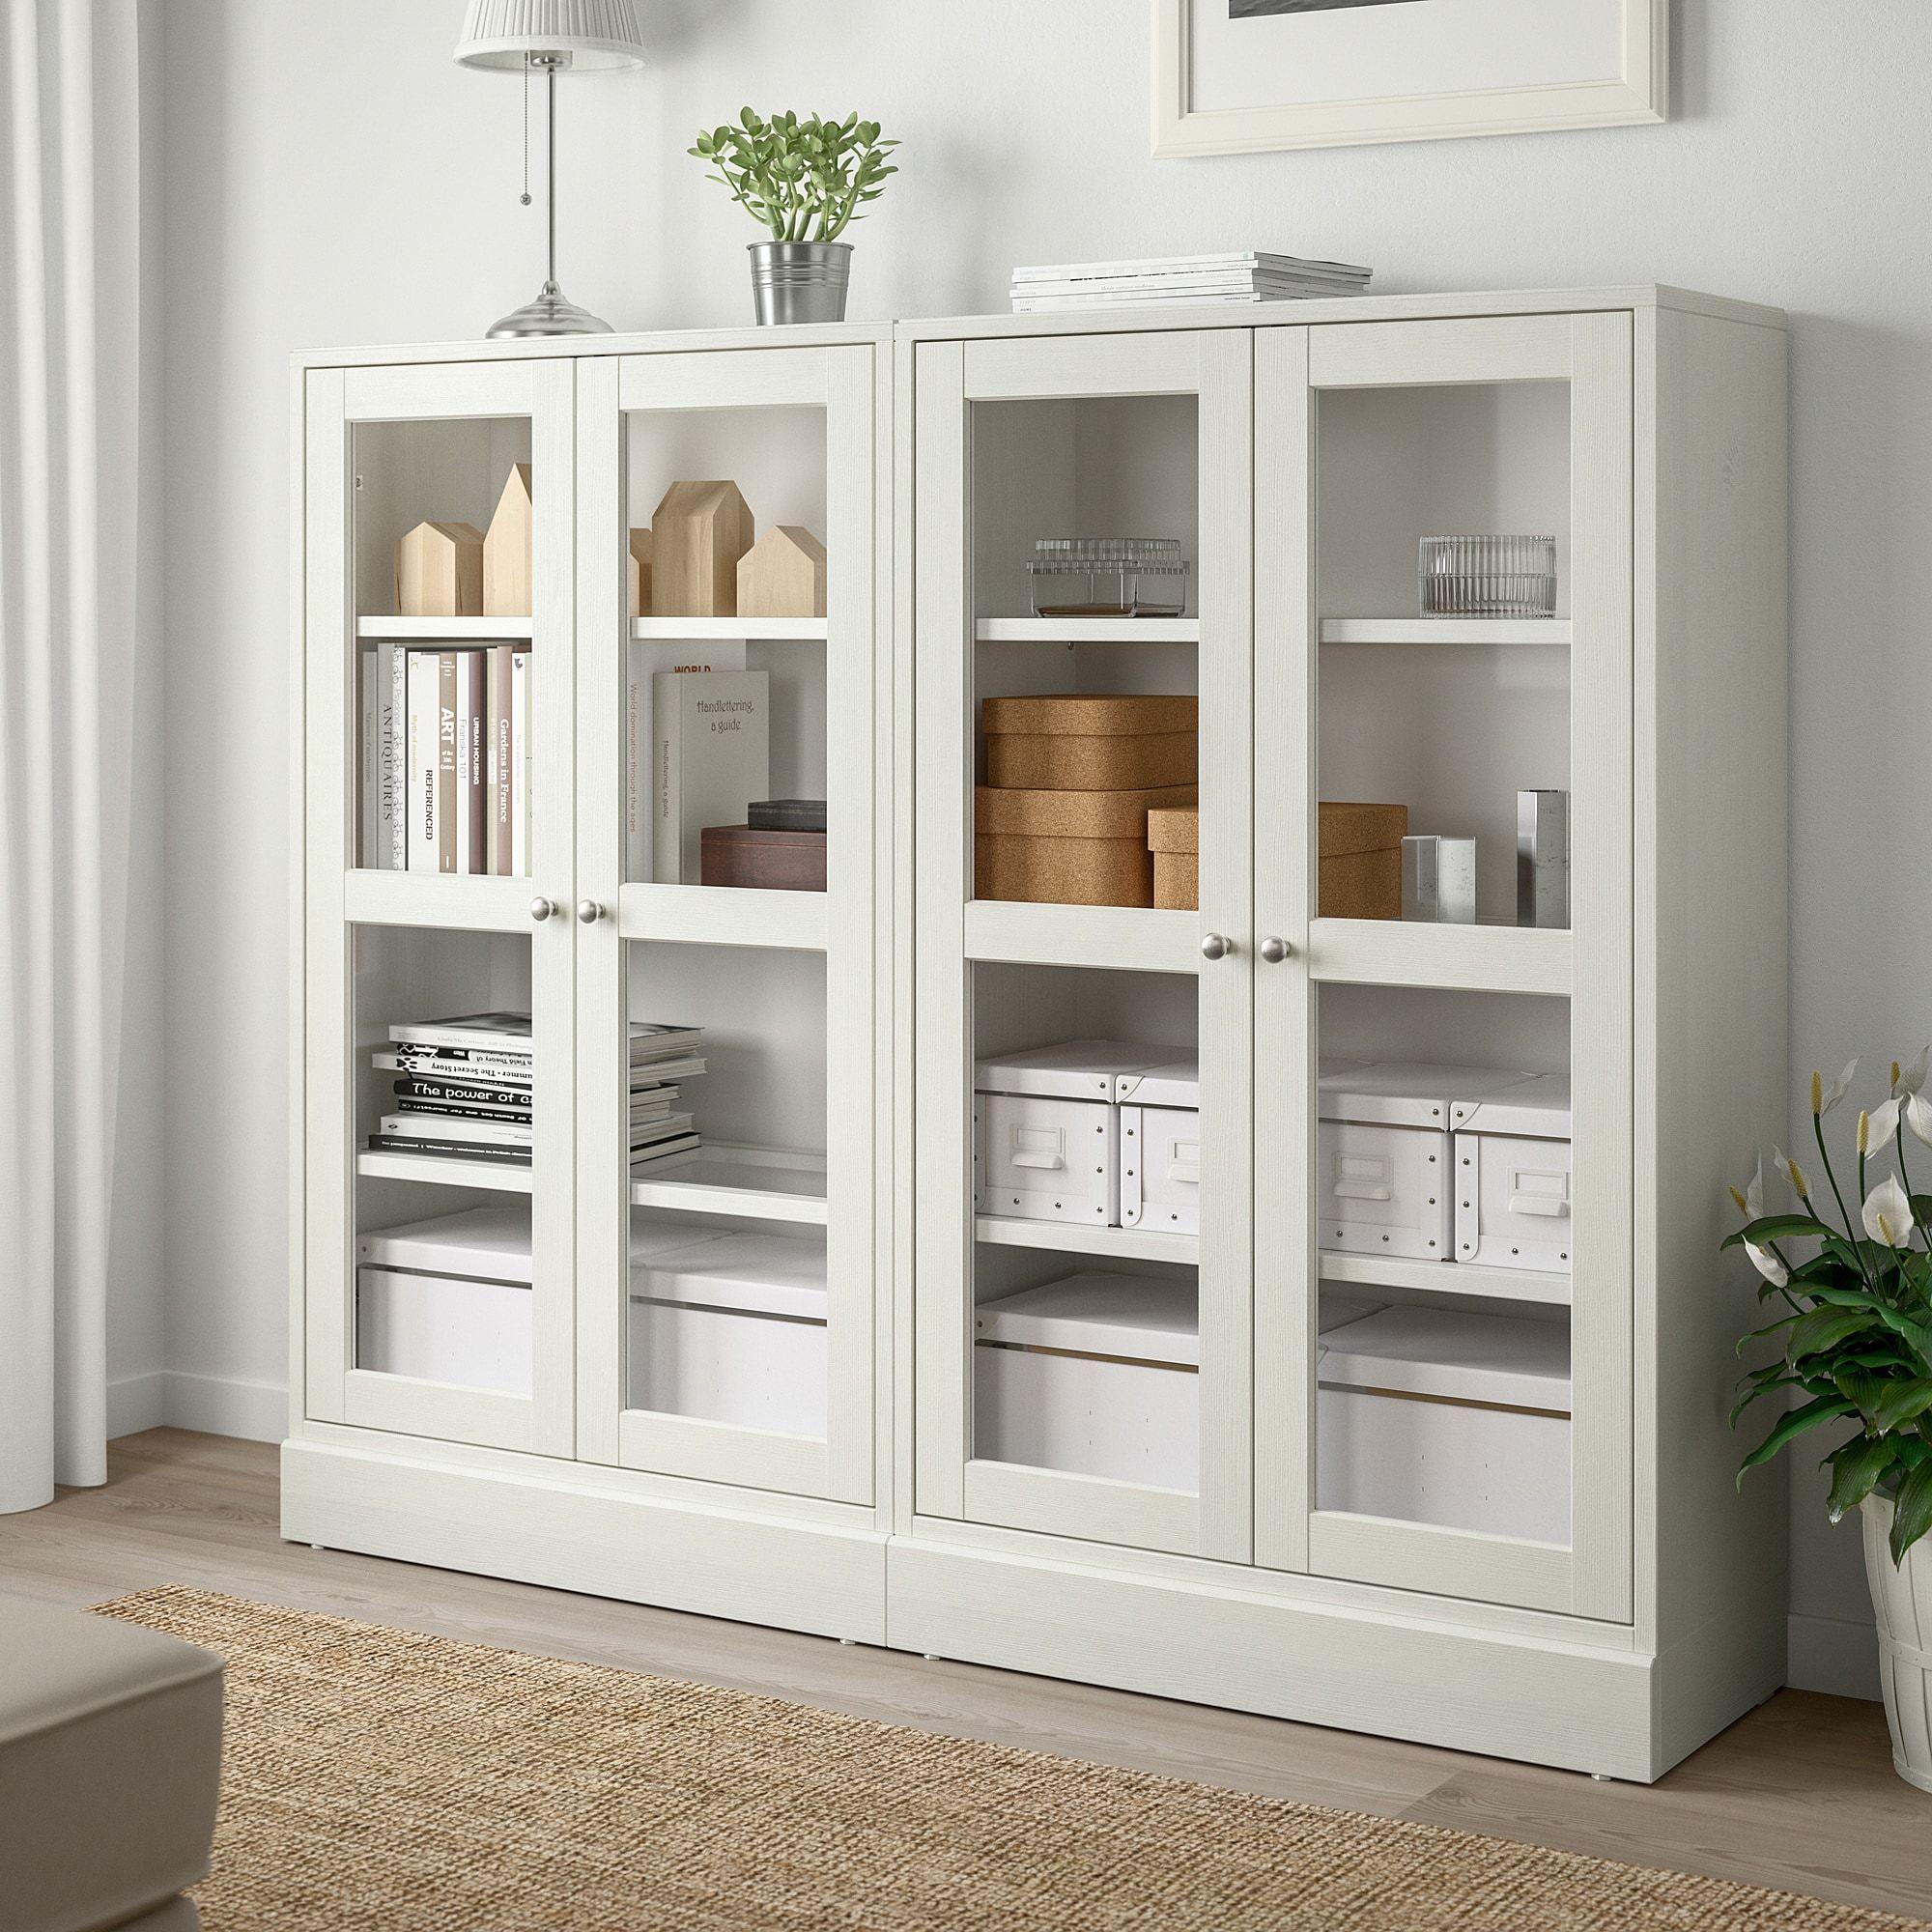 ikea  havsta storage combination wglass doors white